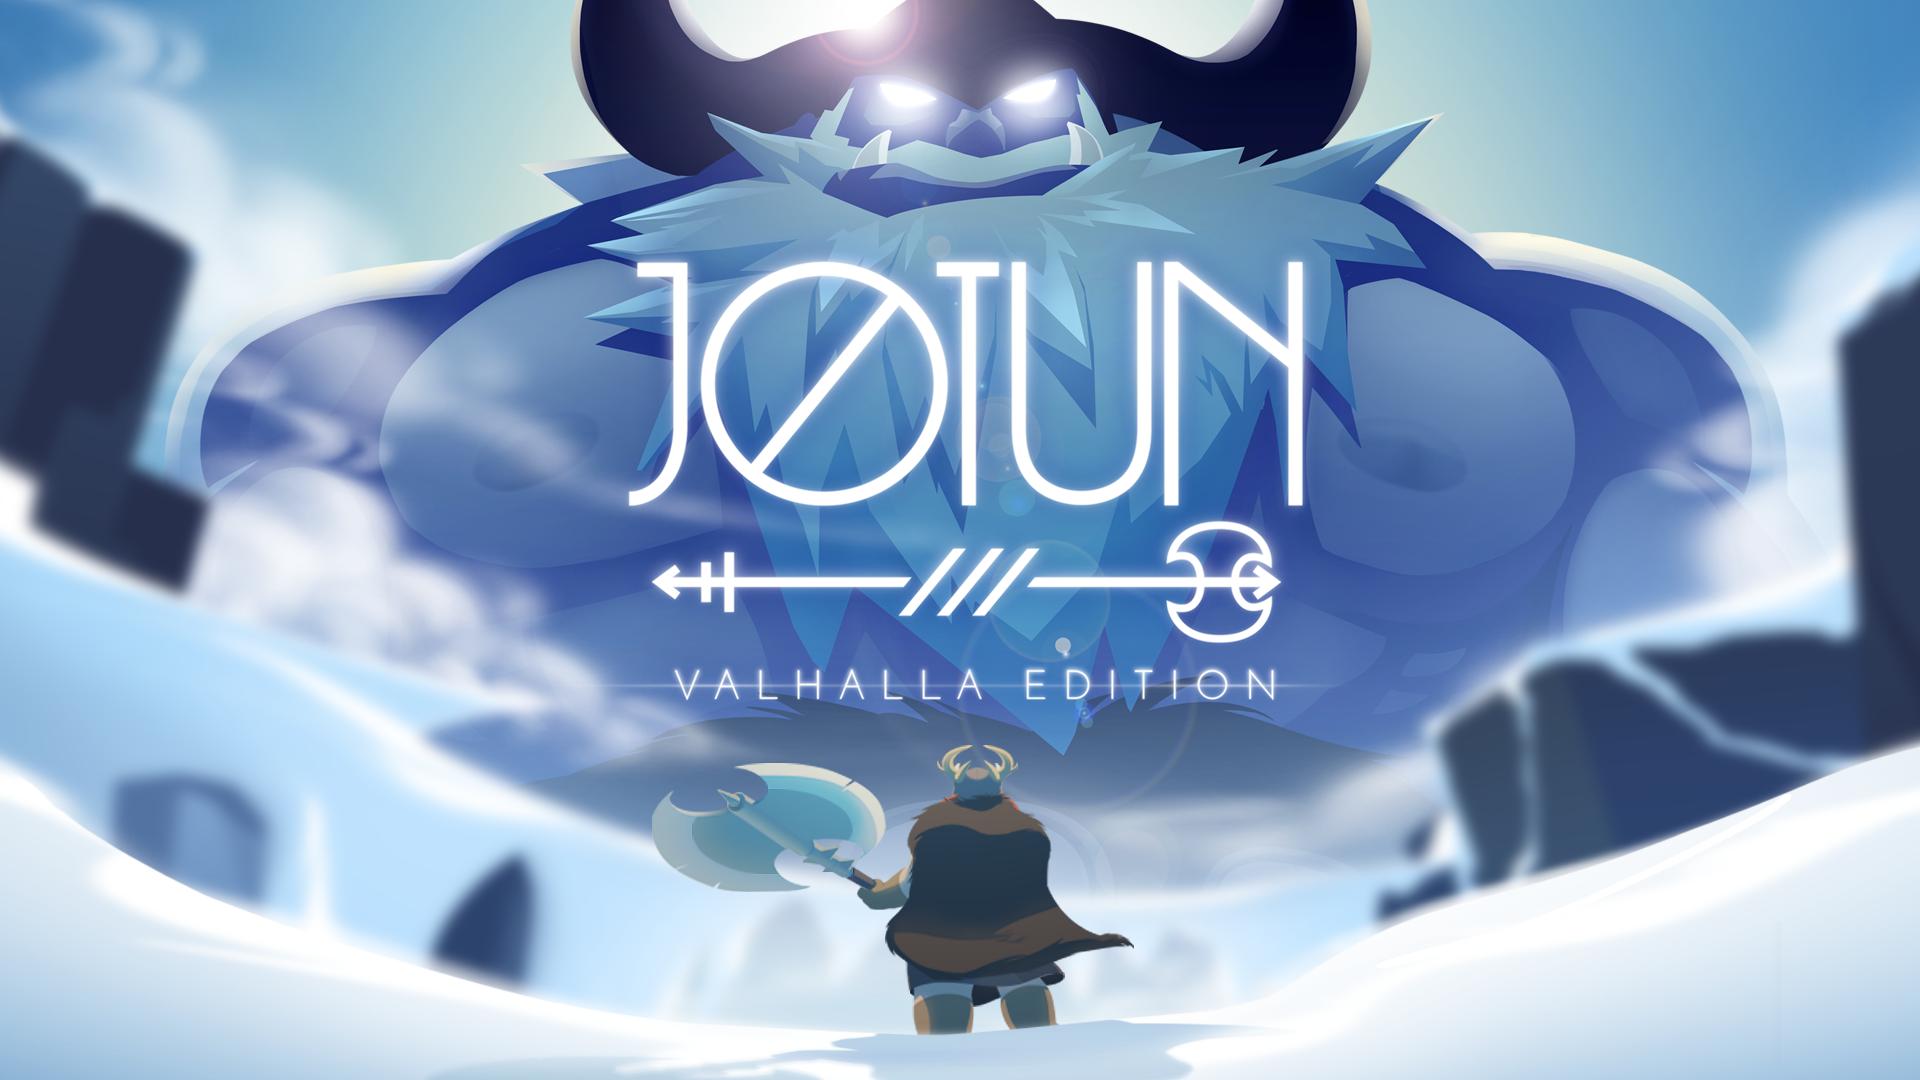 Халява: на PC бесплатно раздают Jotun: Valhalla Edition